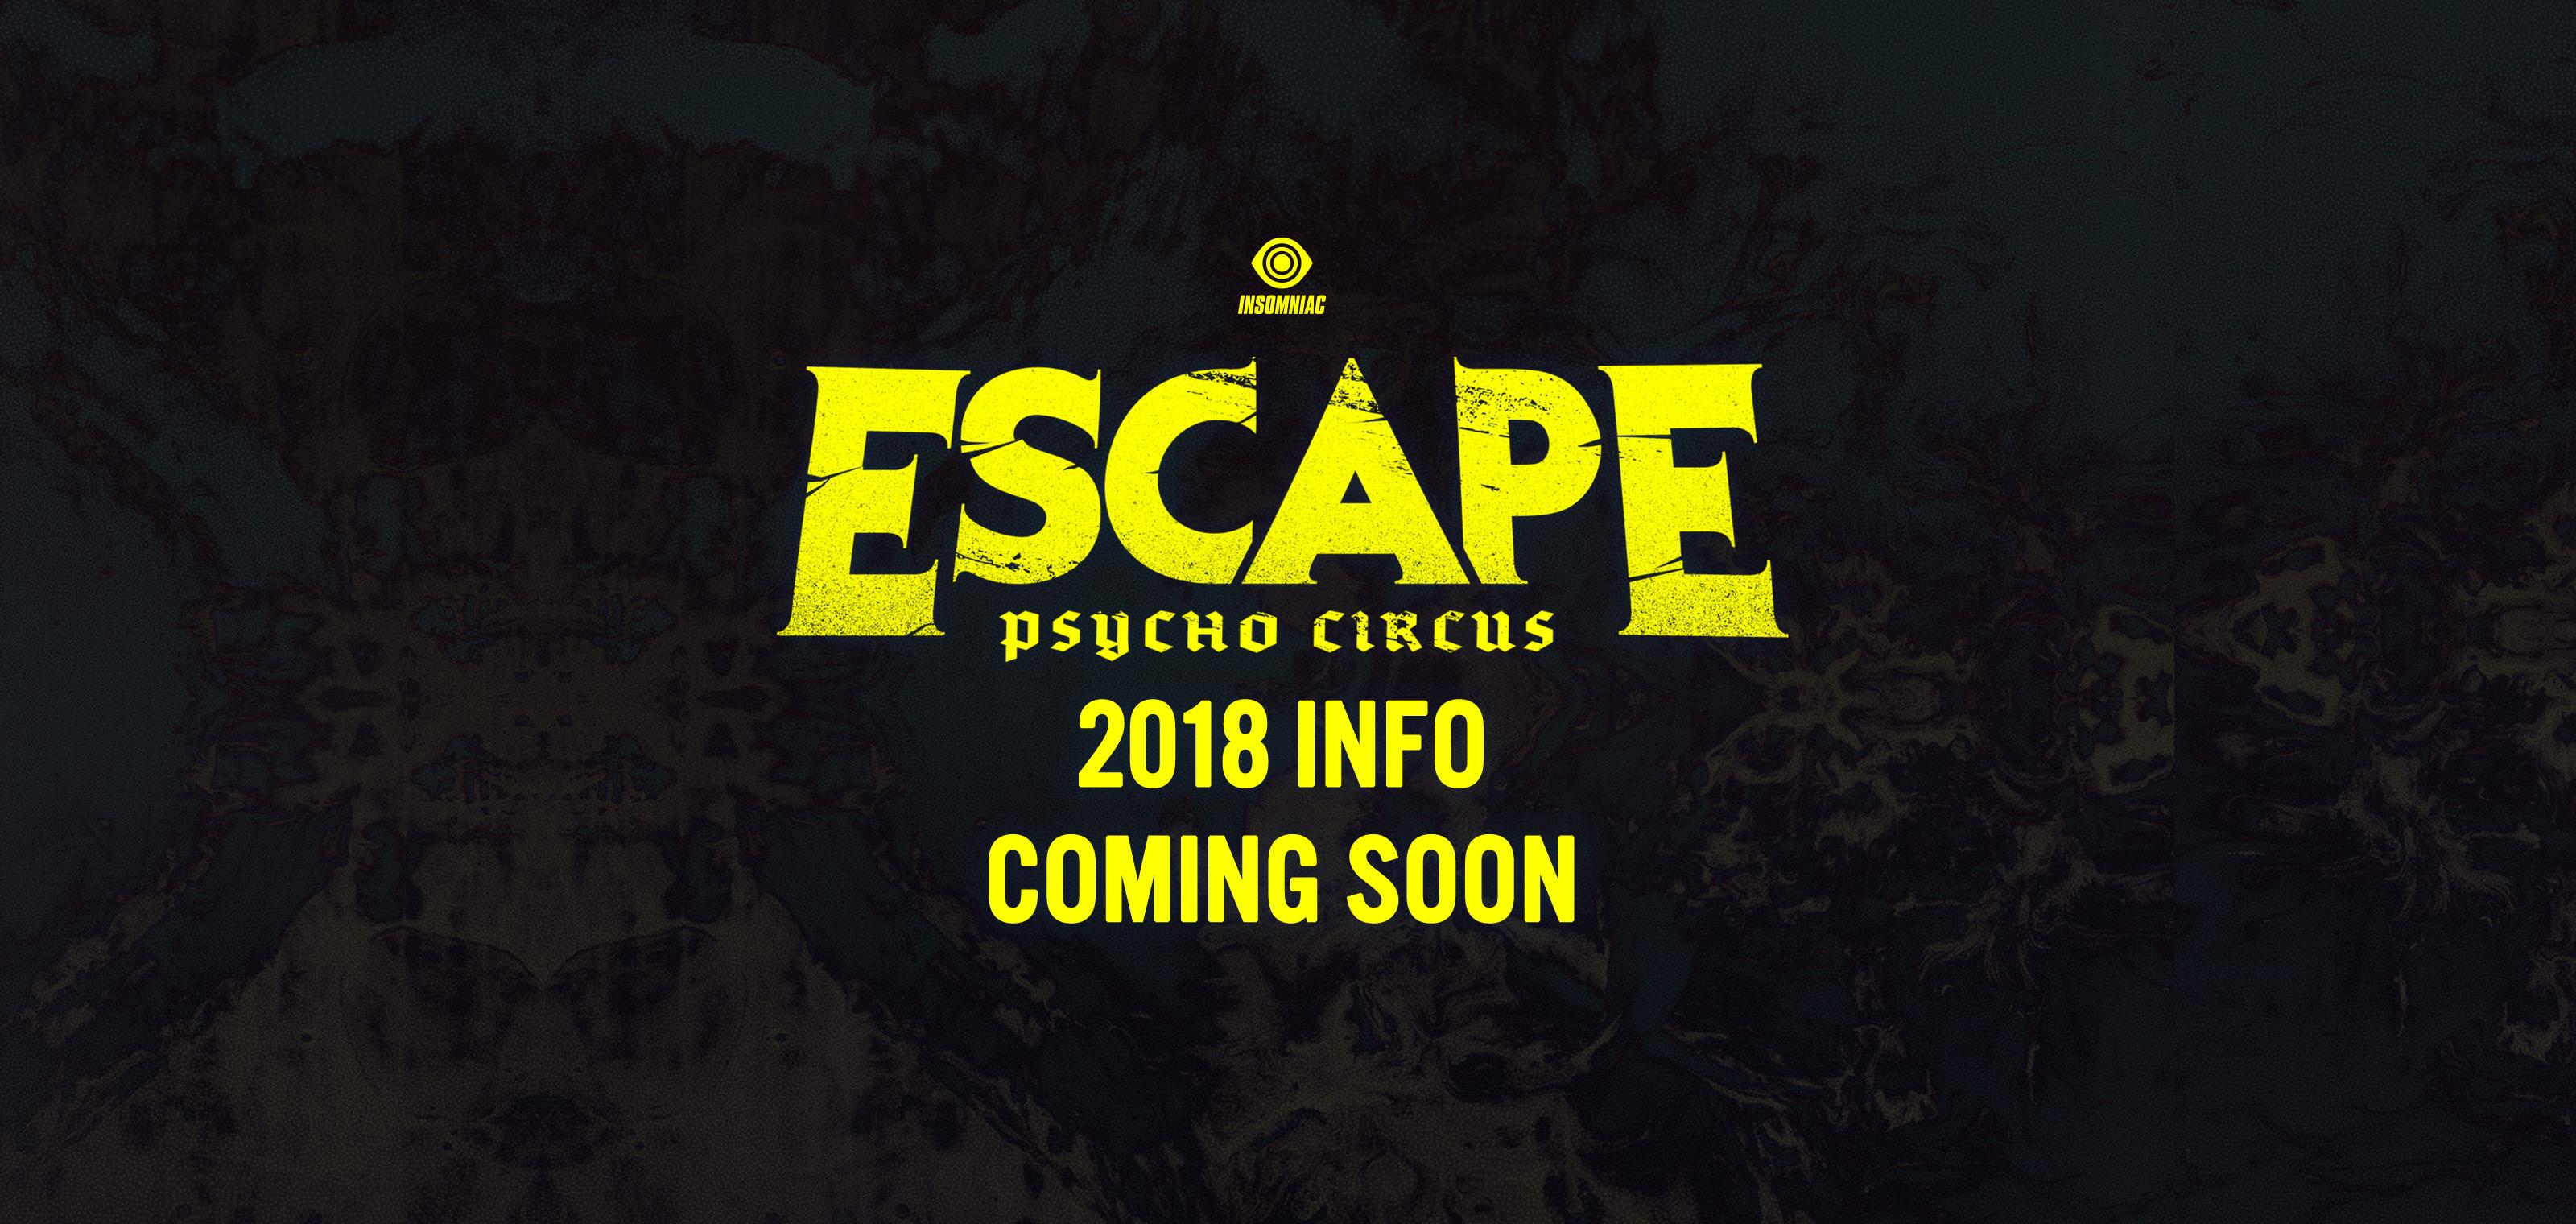 escape psycho circus october 26 27 2018